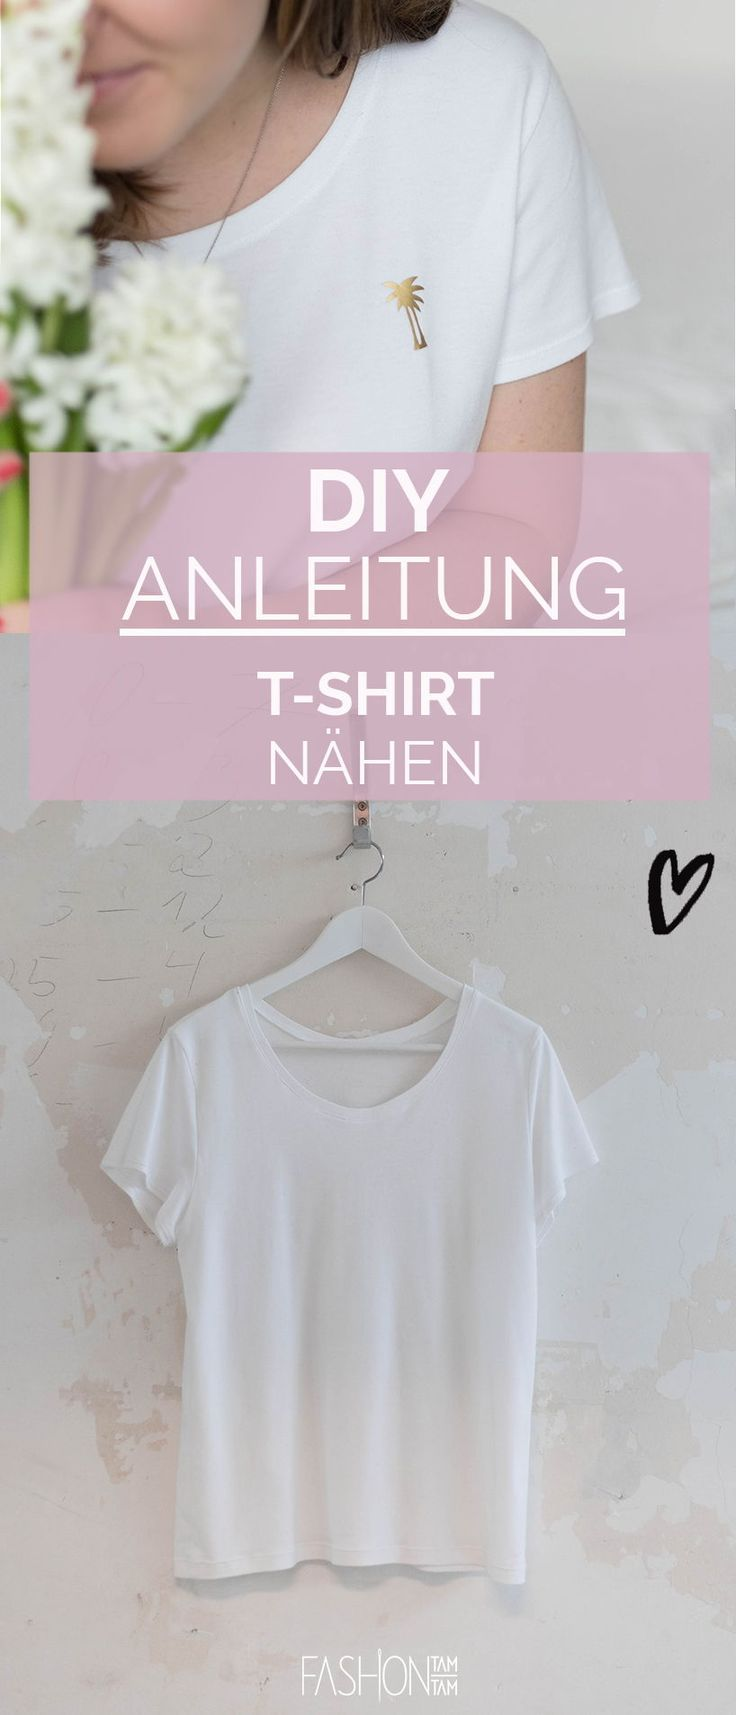 529 best DIY Fashion images on Pinterest